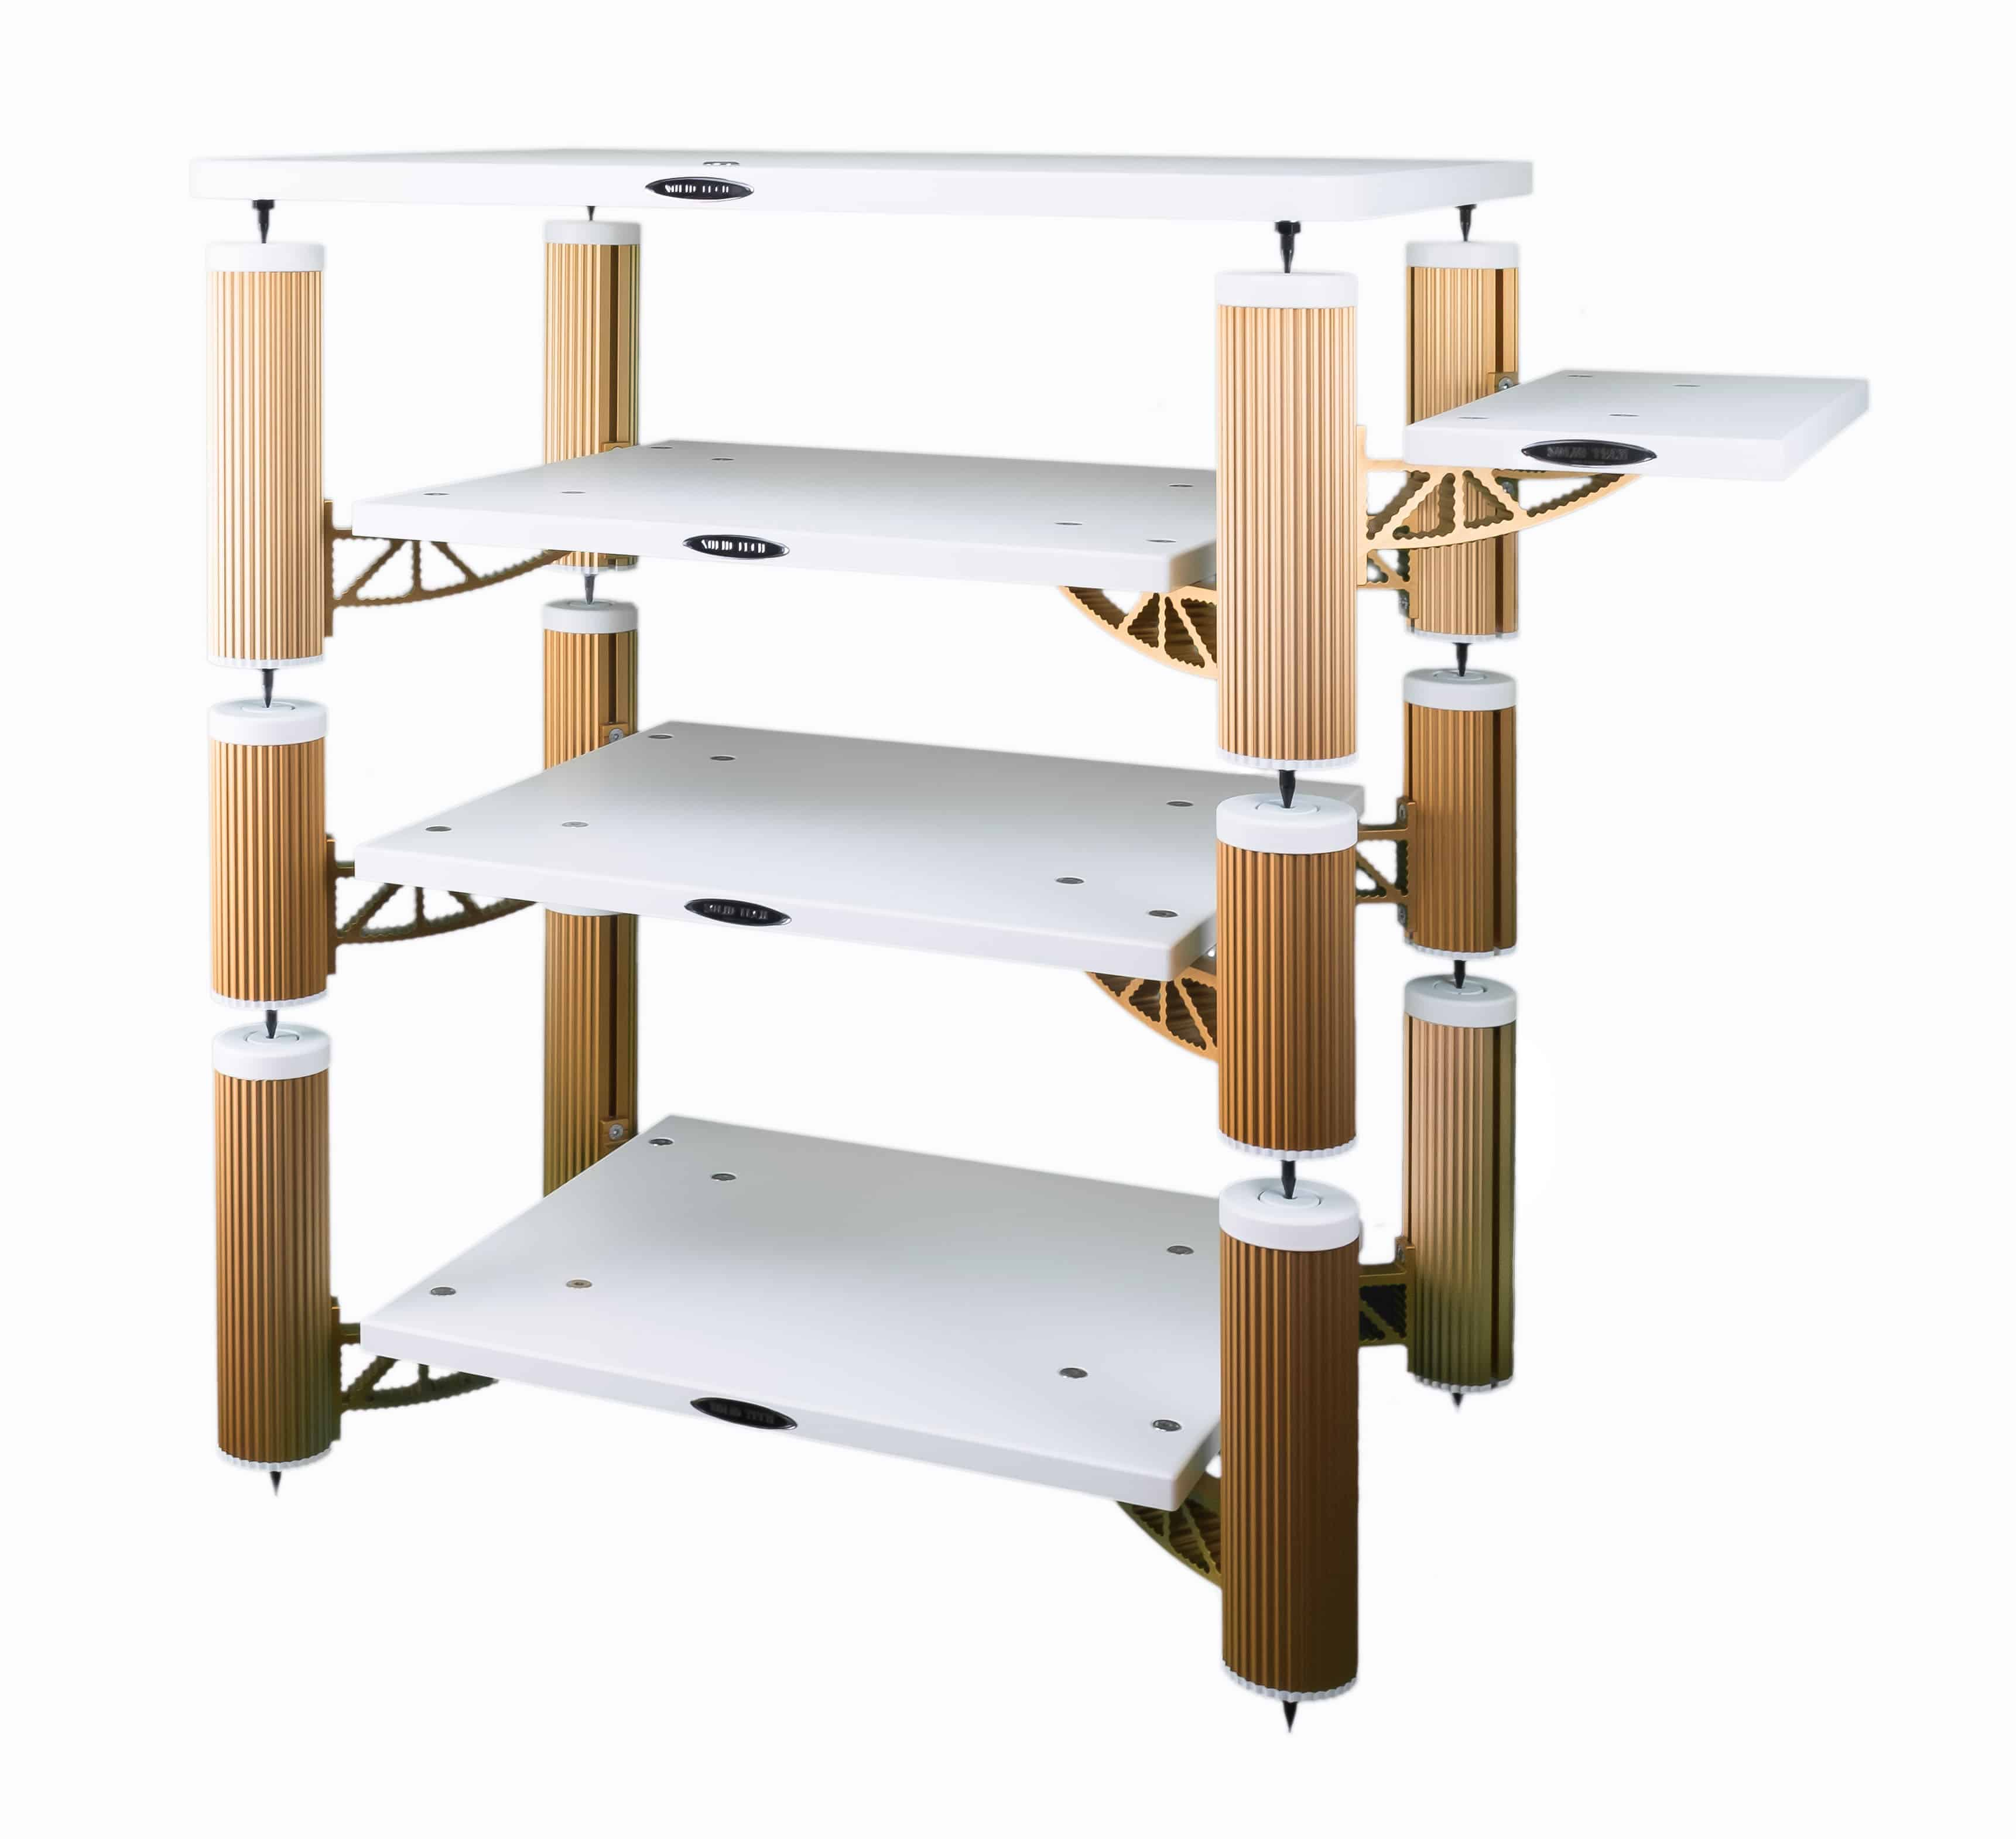 Copper anodized aluminium and white shelves Image